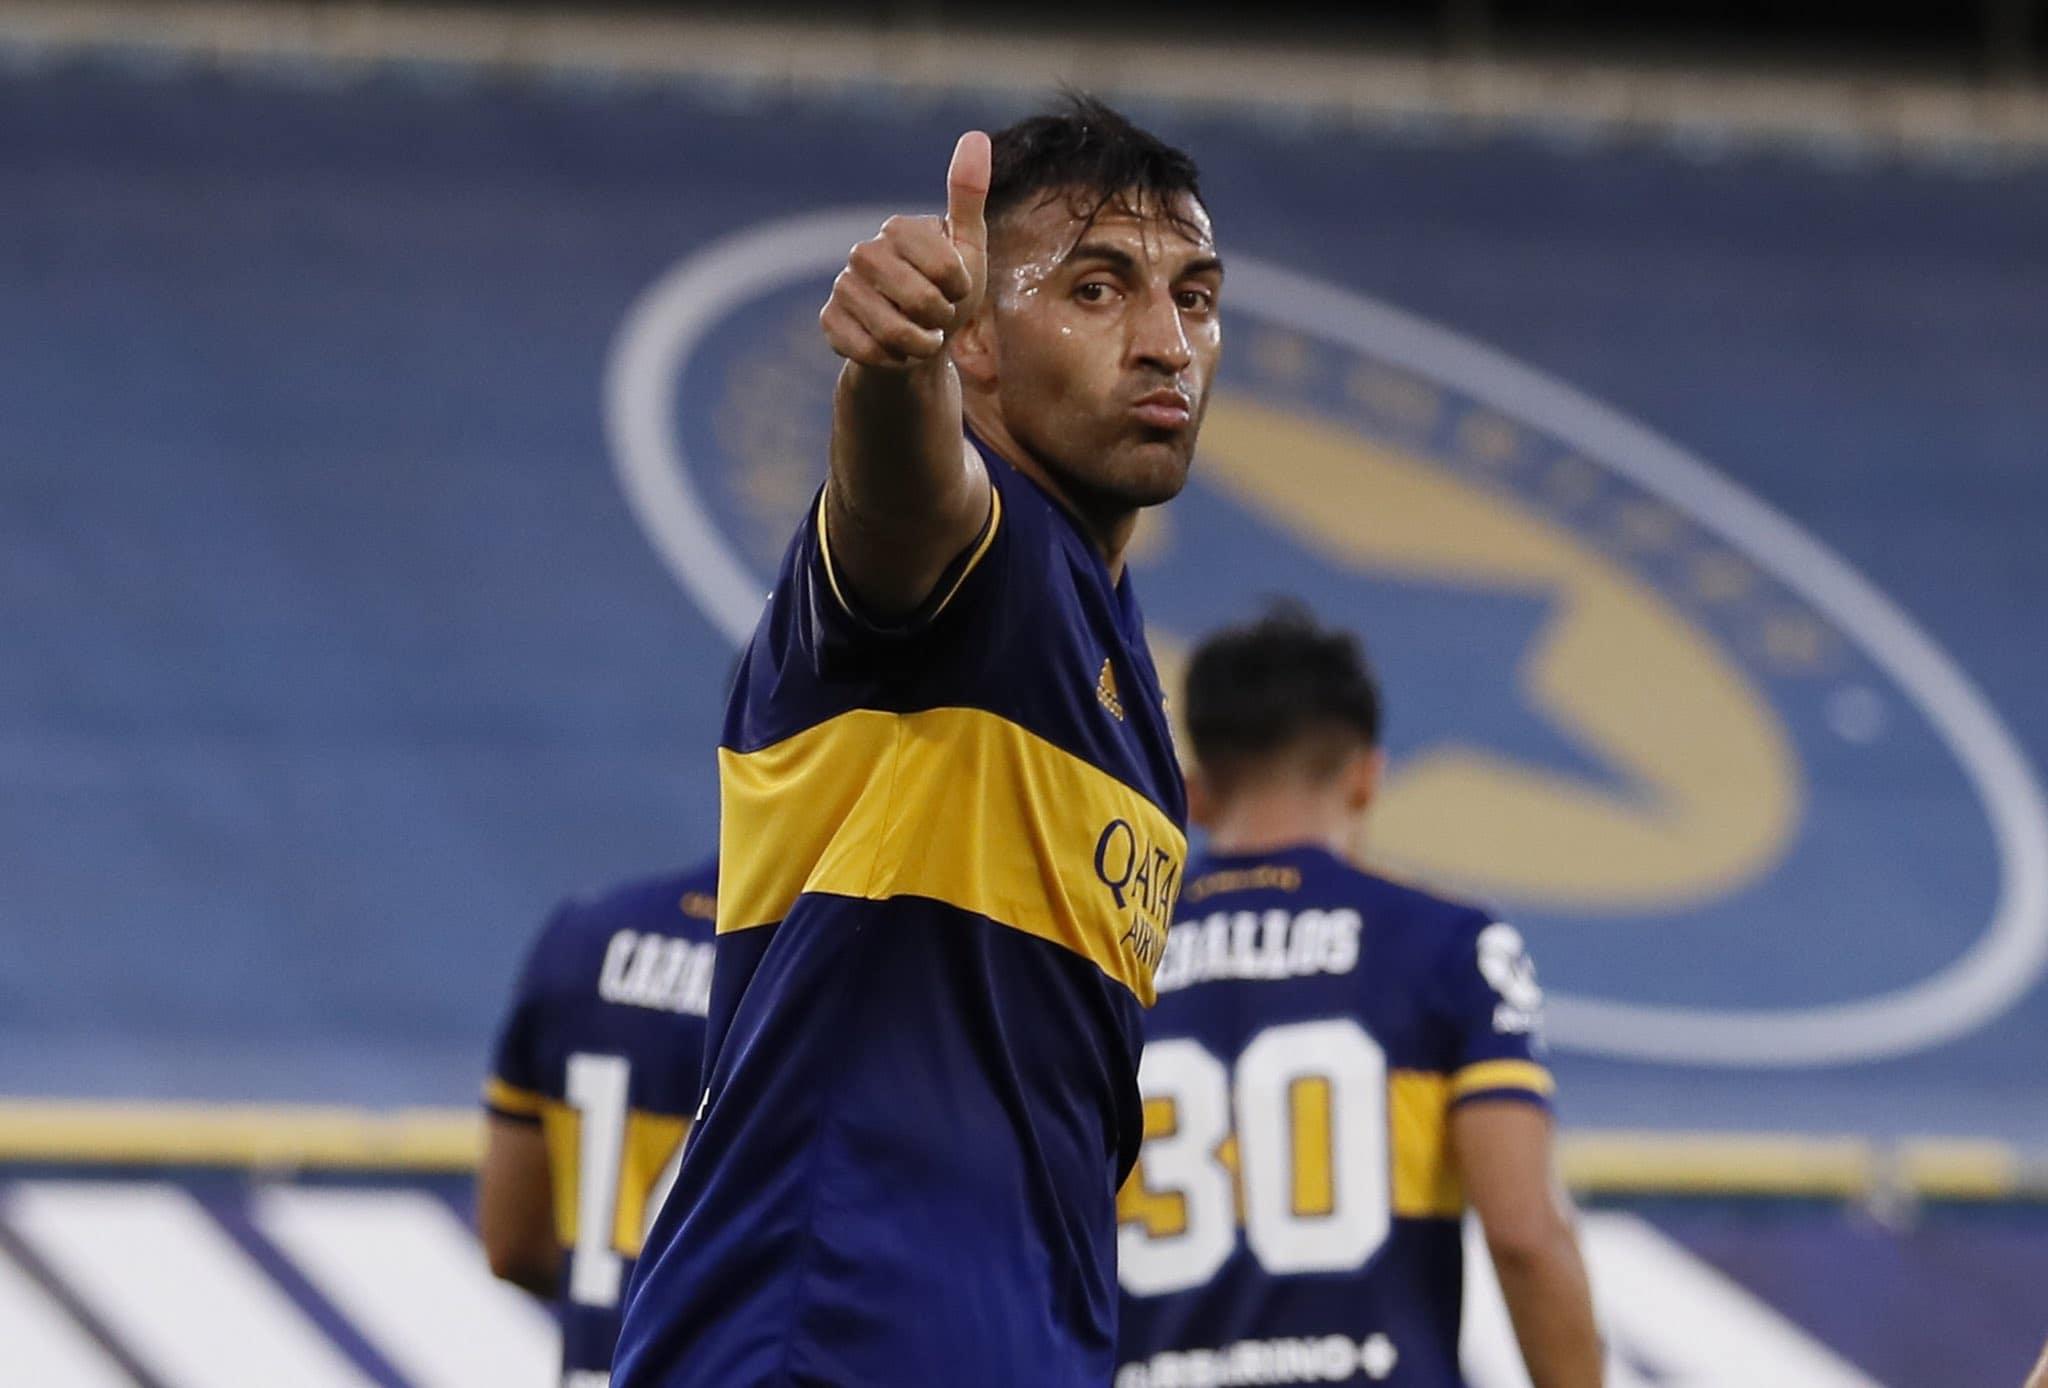 Con doblete de Wanchope Ábila, Boca derrotó a Huracán por 3 a 0 en La Bombonera